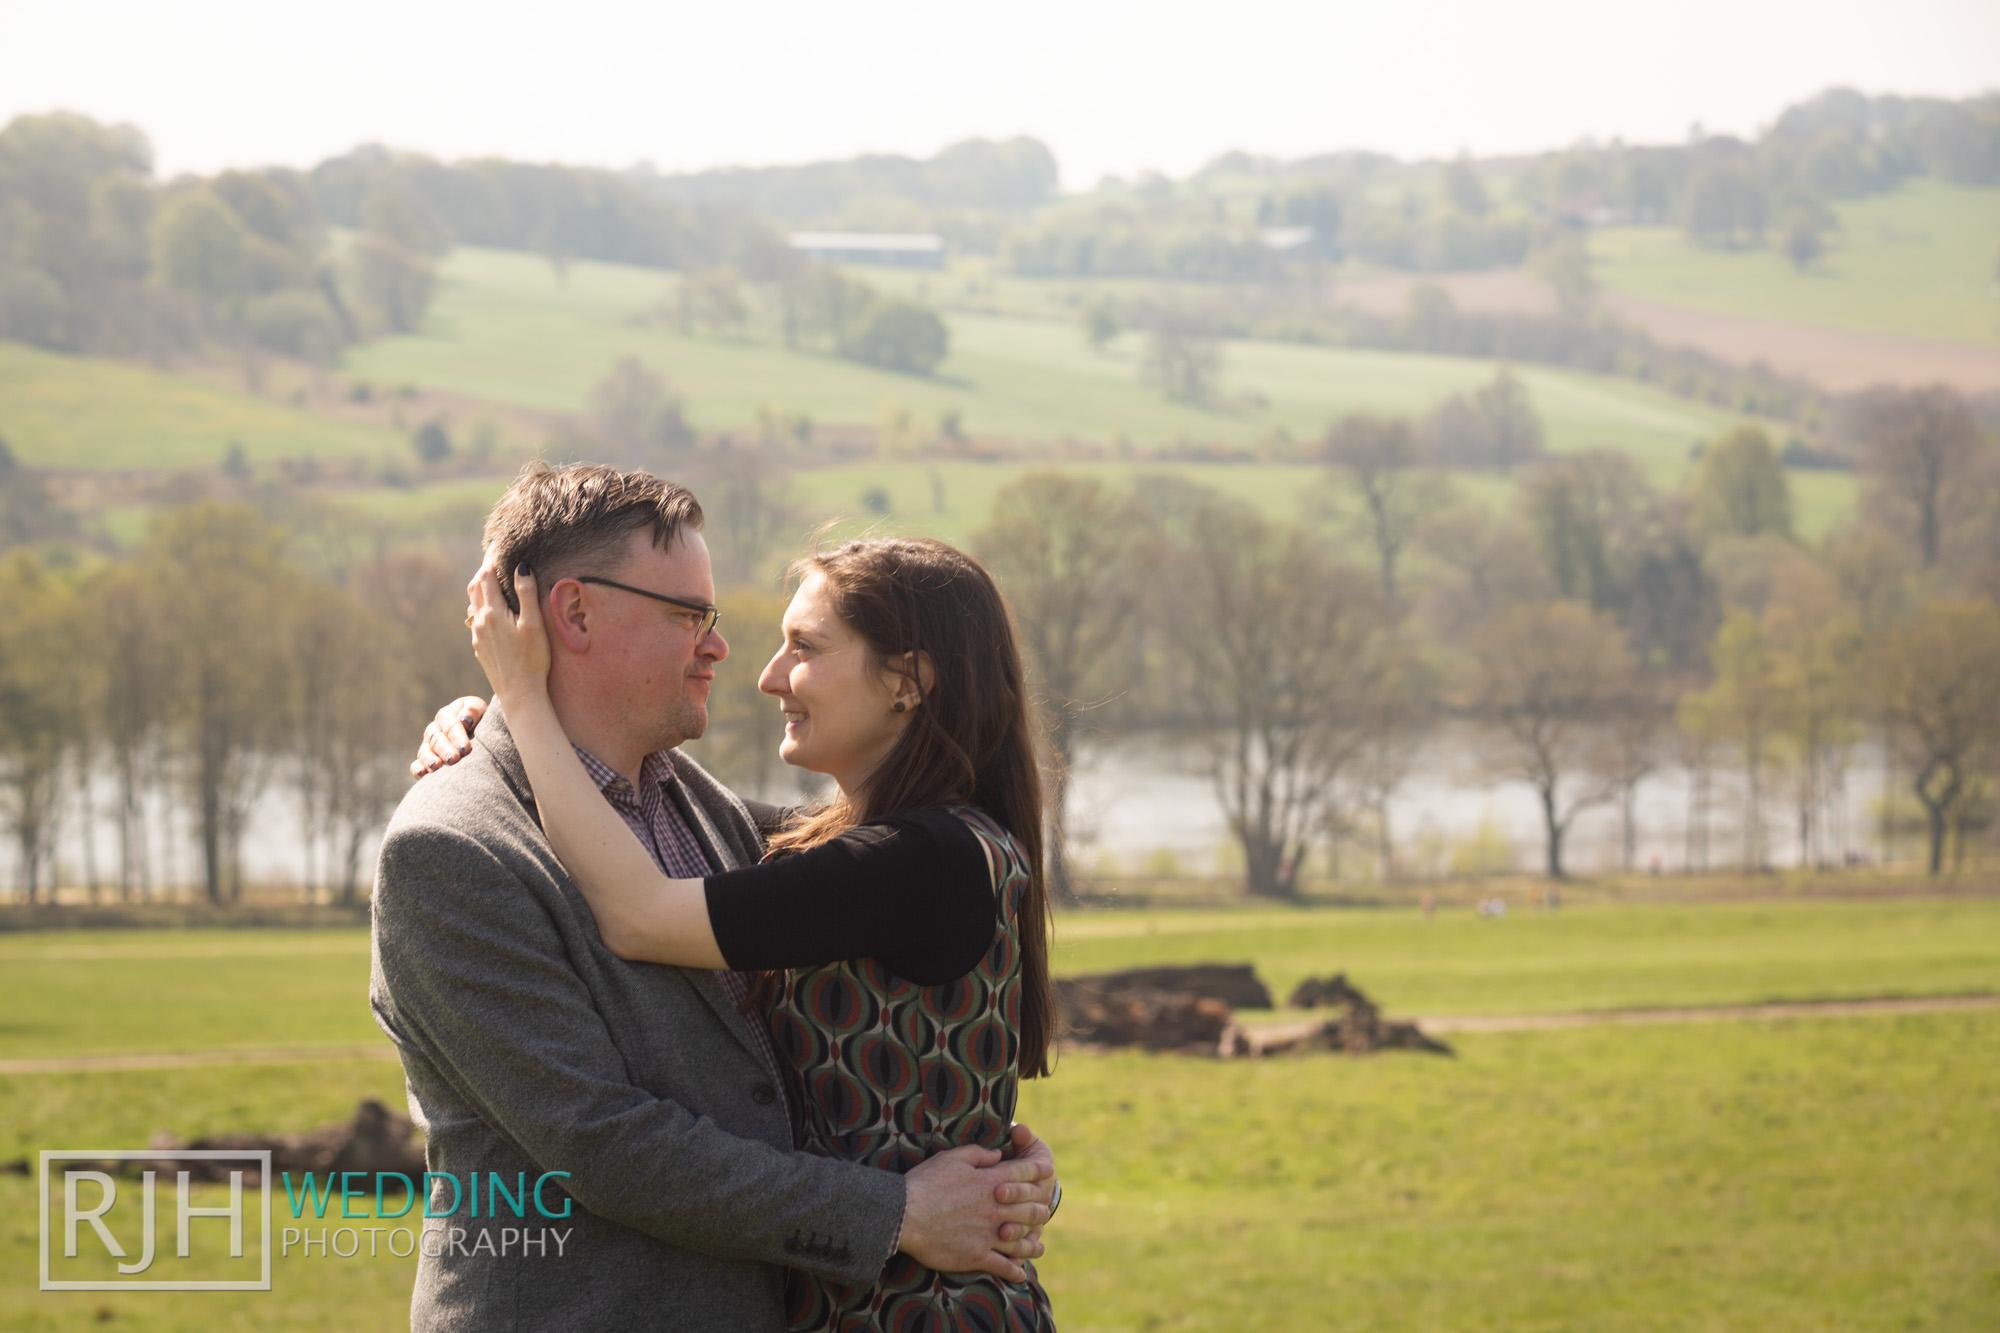 Pre-wedding photography - Richard & Rachel_037_3C2A8356.jpg